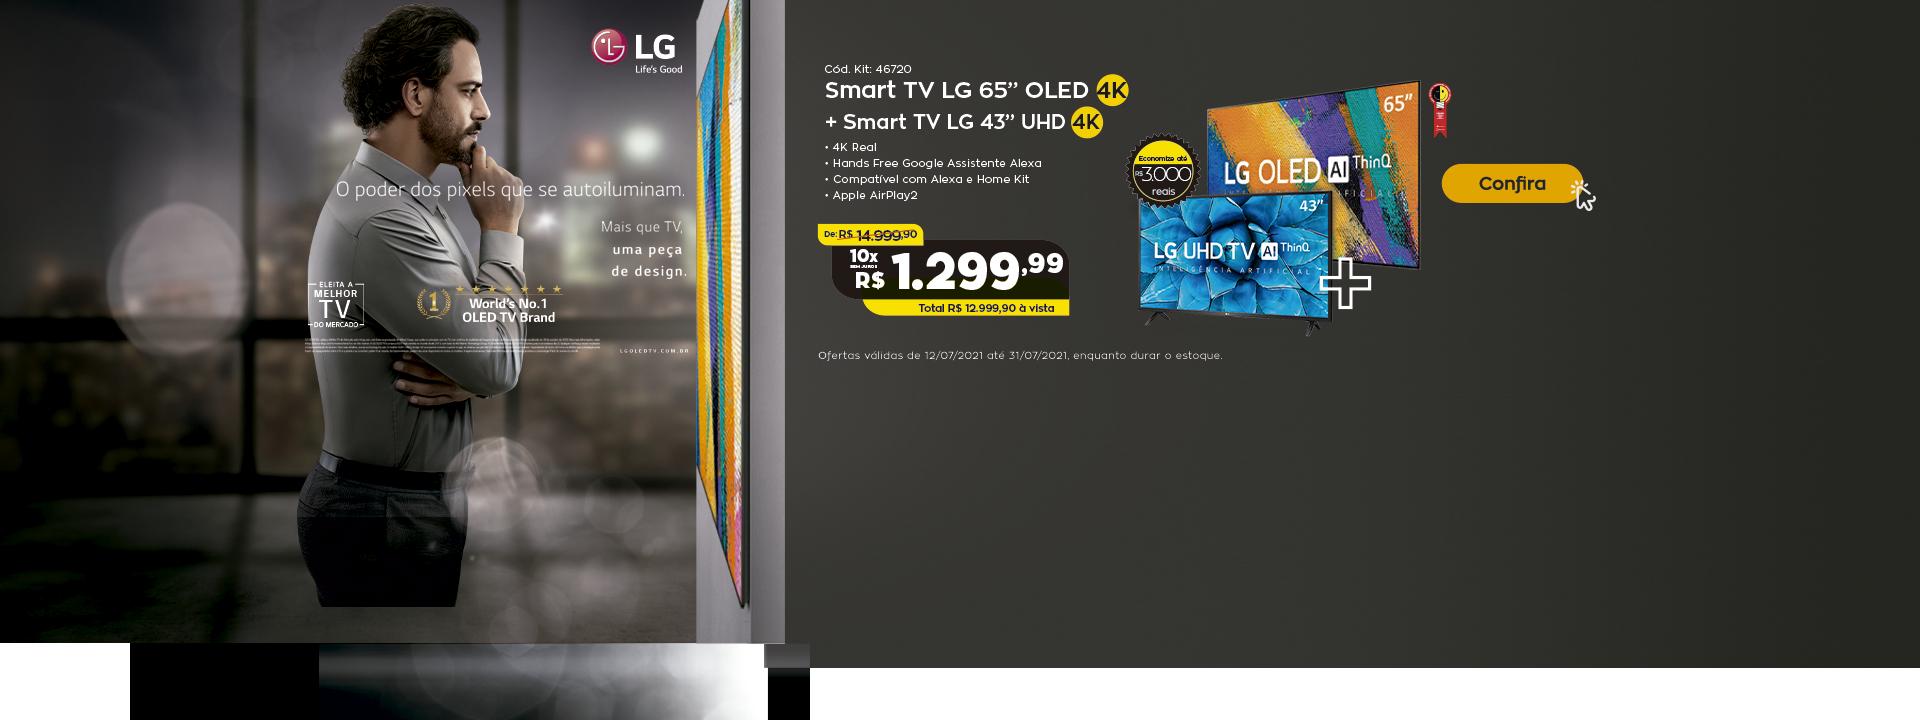 LG TV